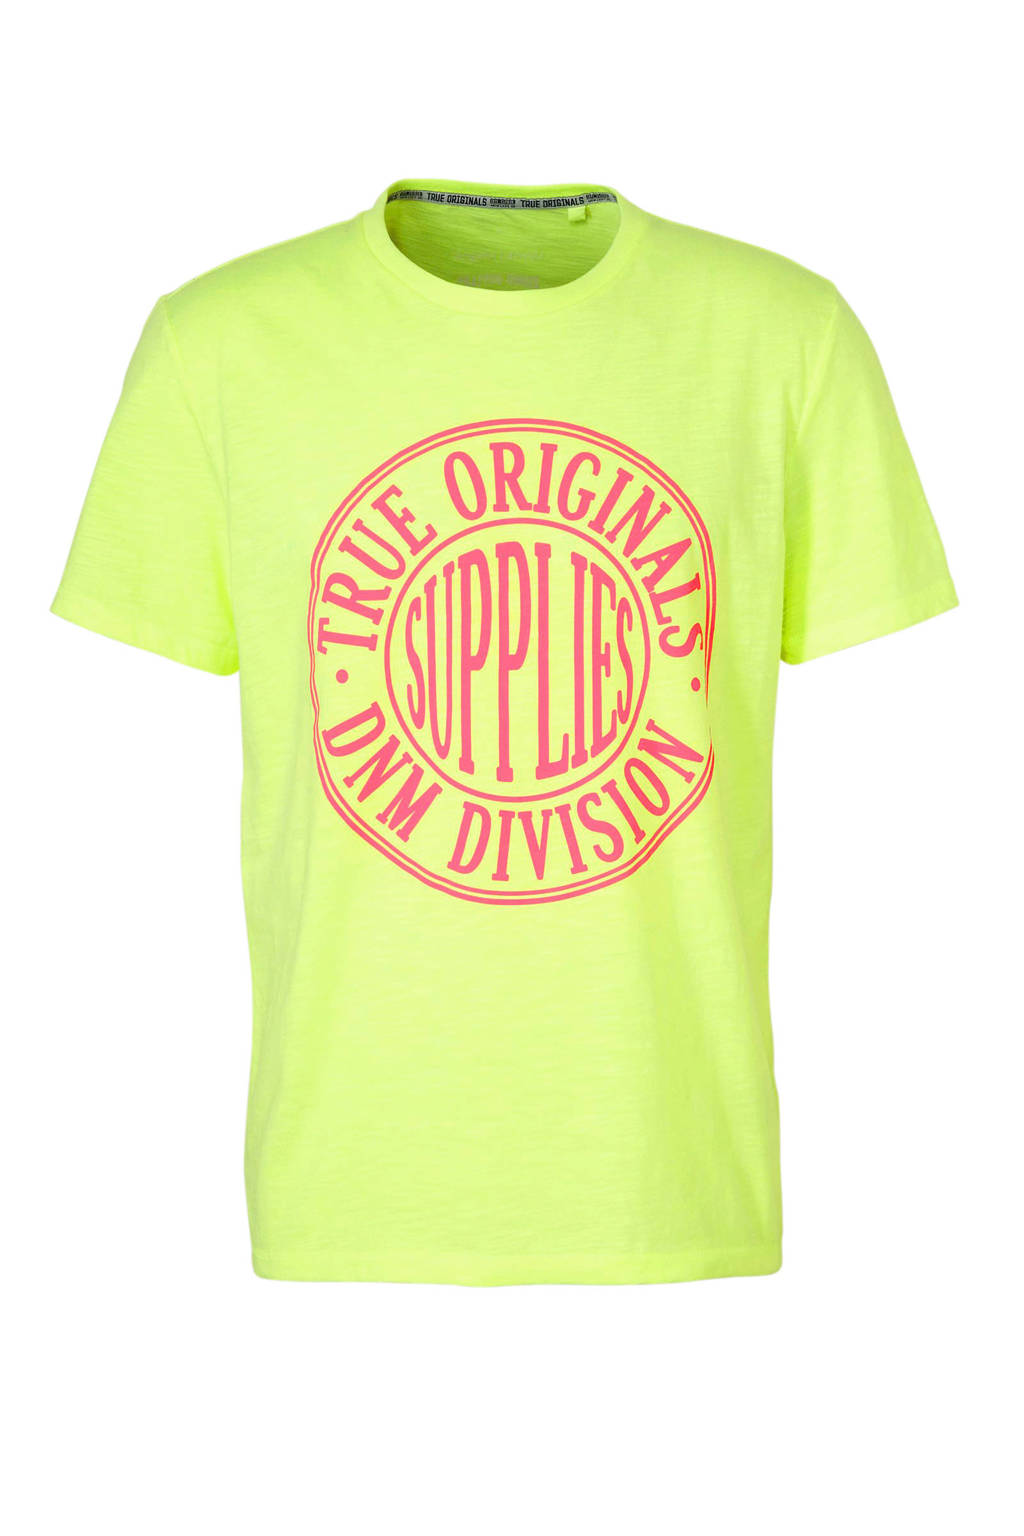 C&A Angelo Litrico T-shirt met printopdruk, Geel